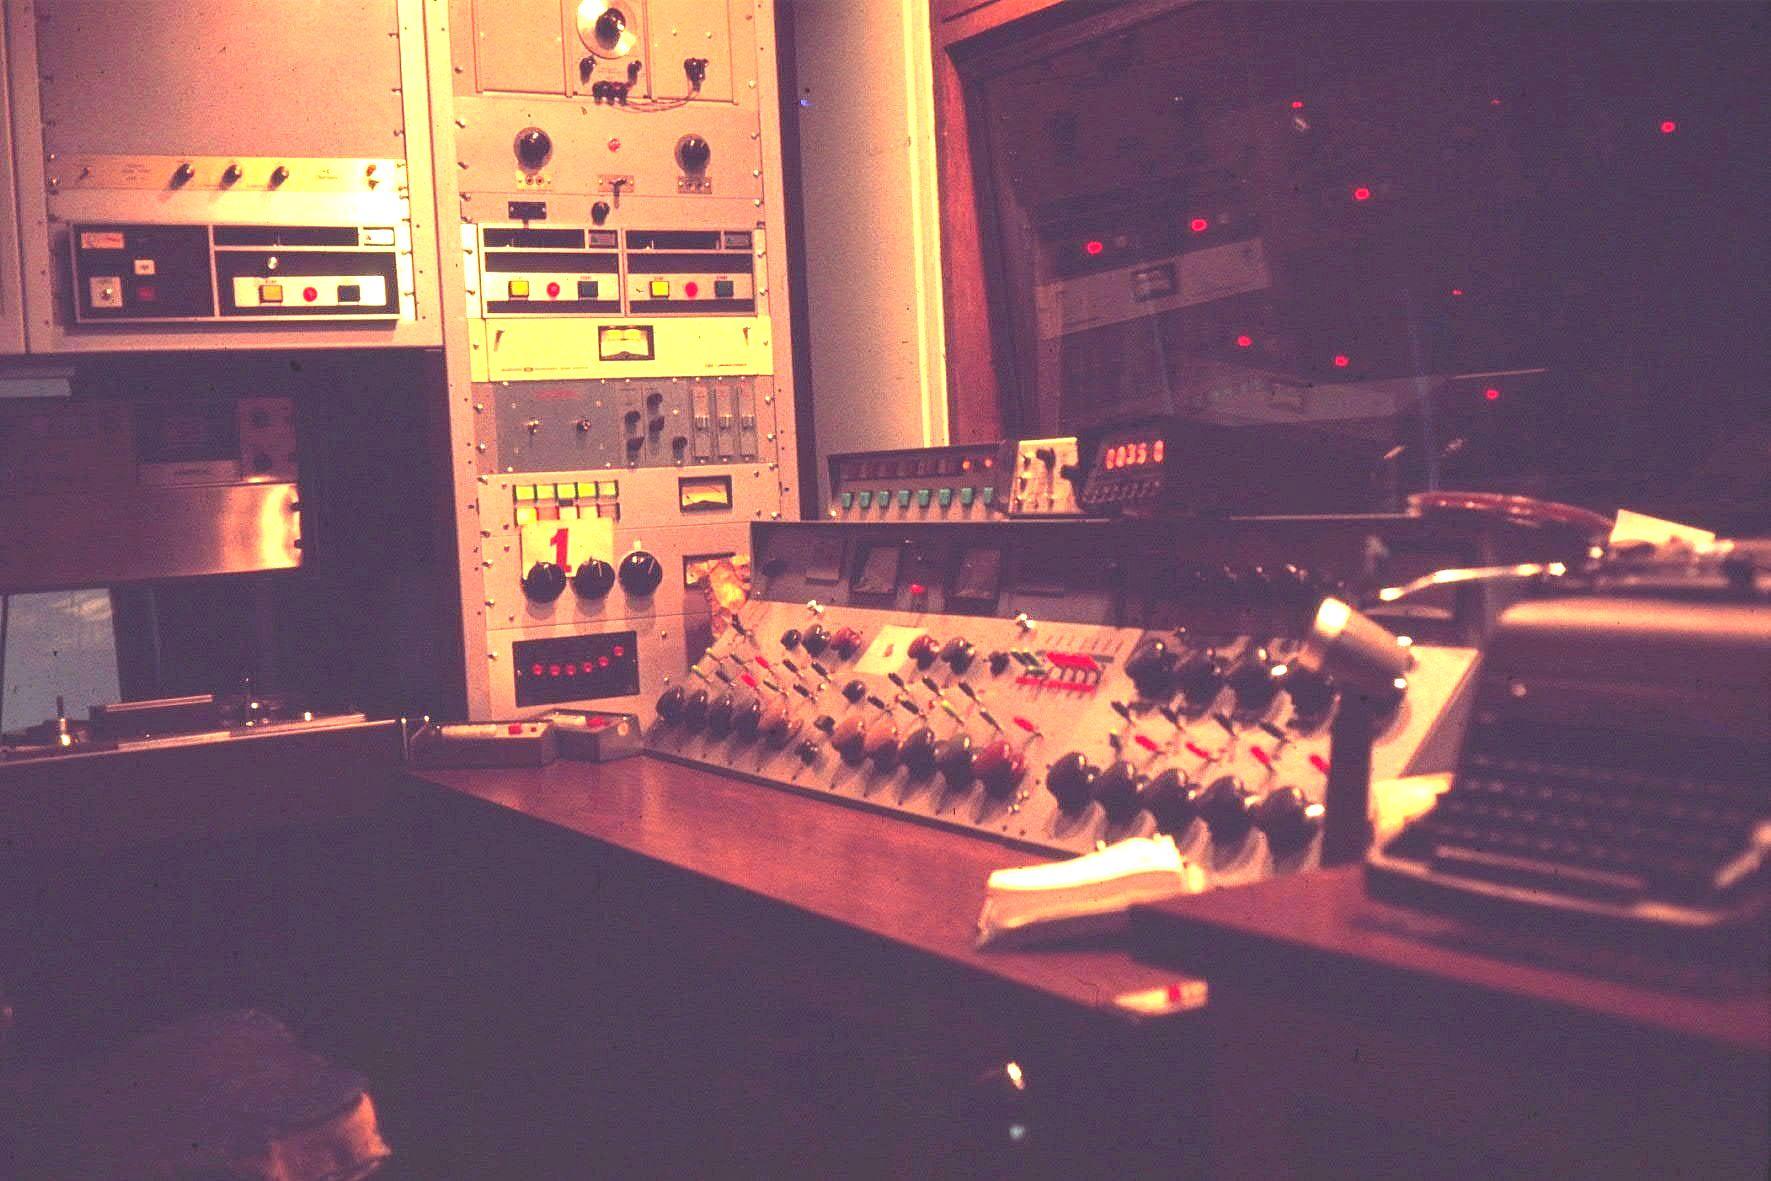 wcfl-march_1976-studio-b-control-room-lights-off-in-studio-b